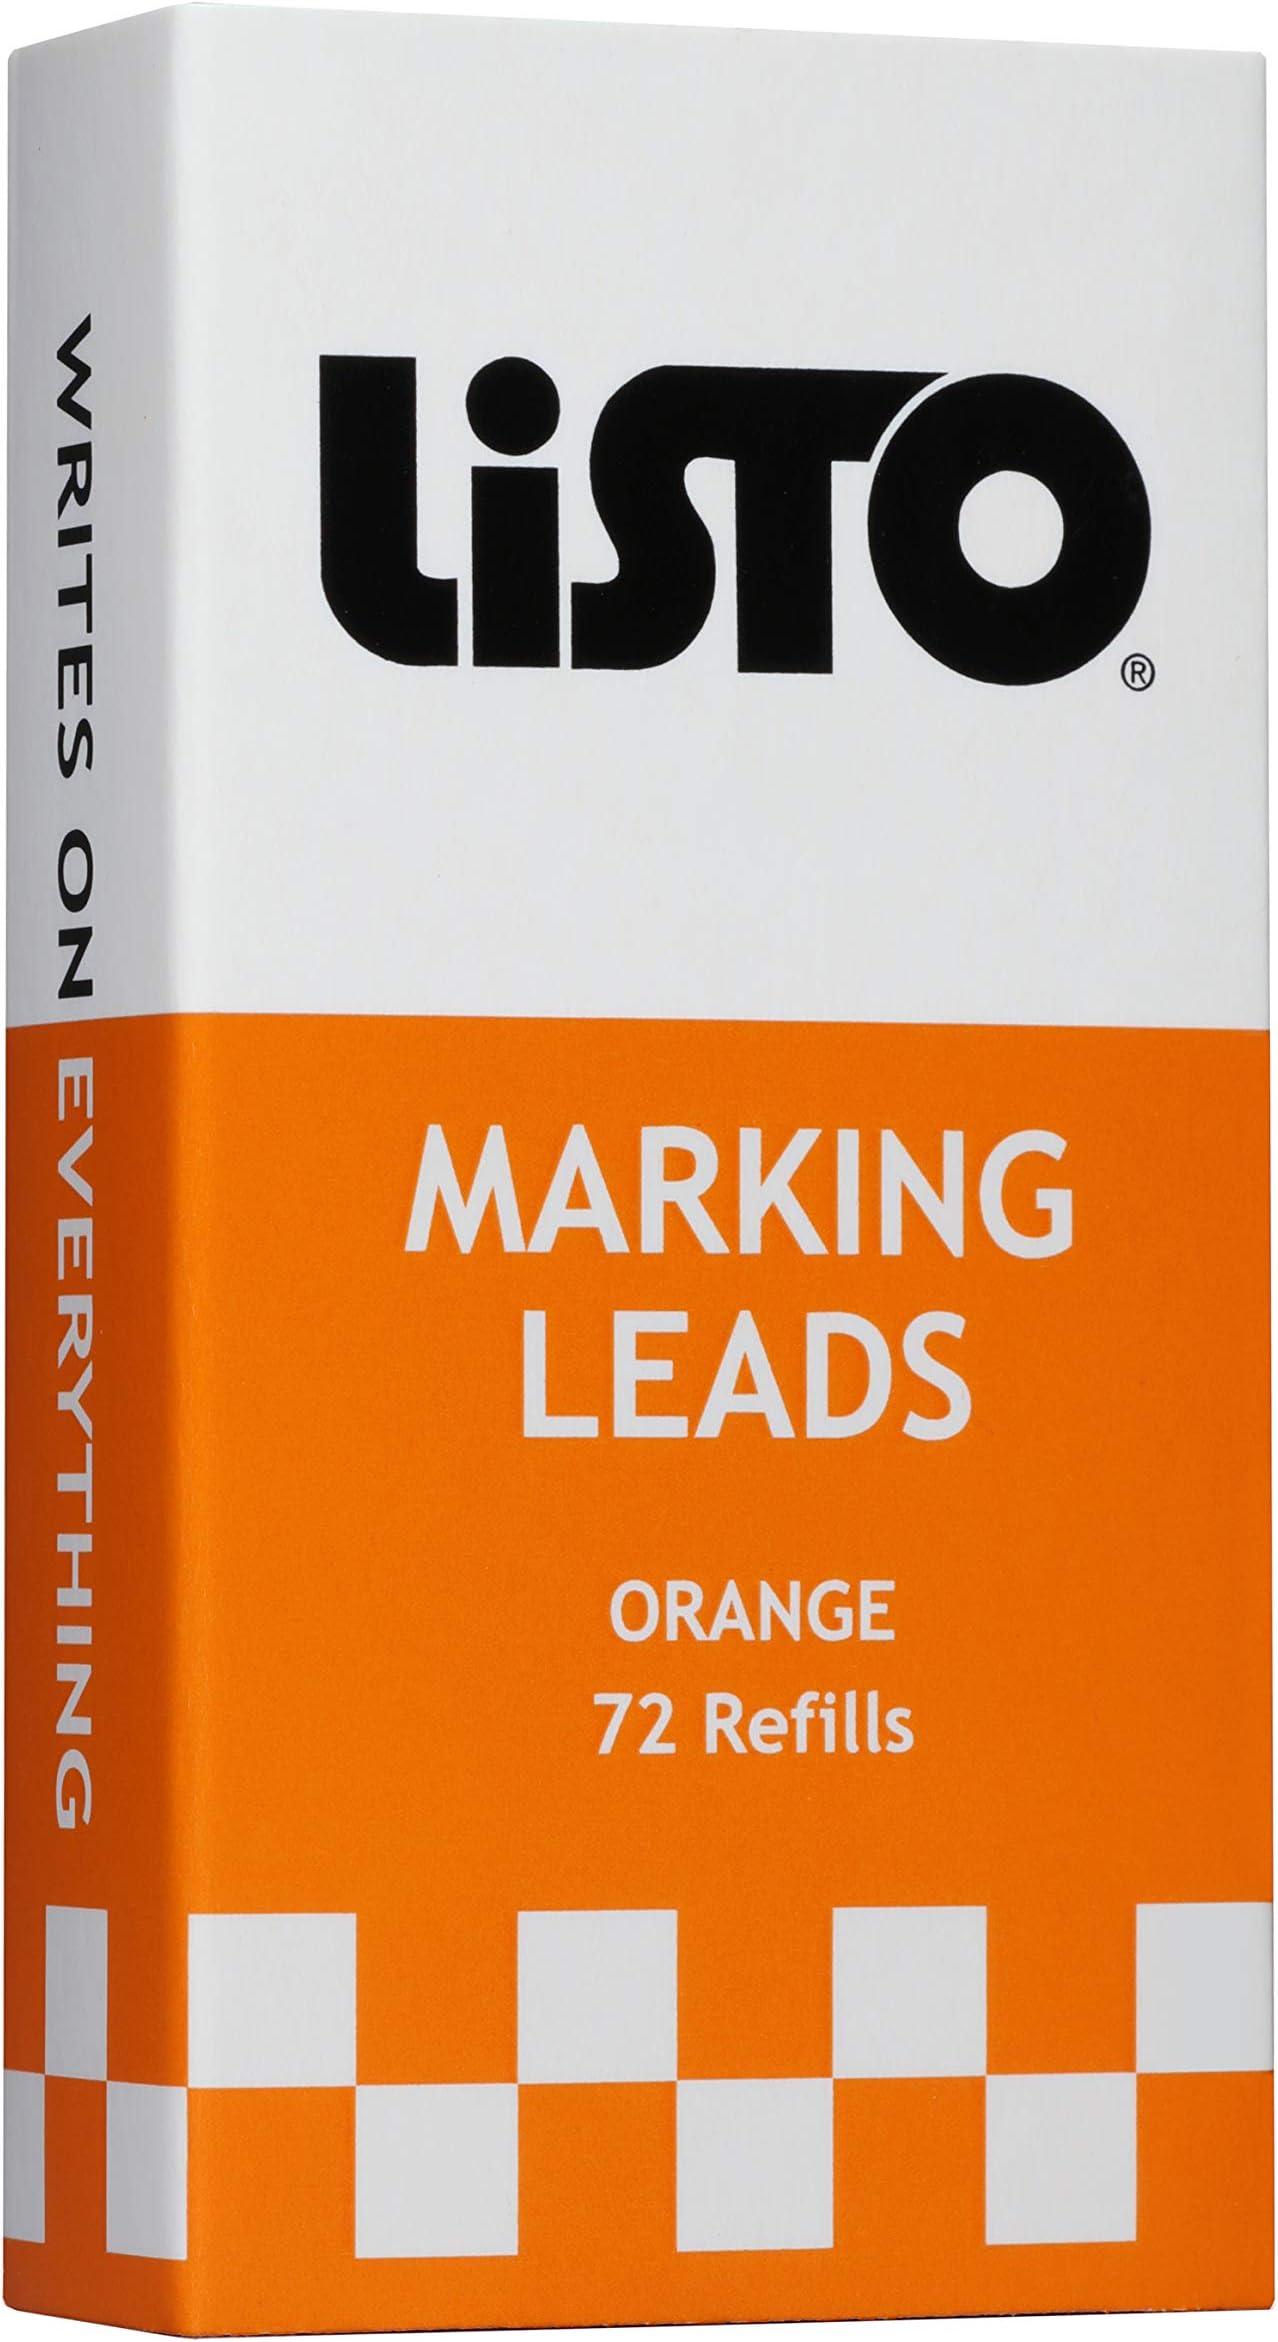 Listo 162 Marking Pencils Refill - ORANGE, Box of 72, Grease Pencils/China Marking Pencils/Wax Pencils